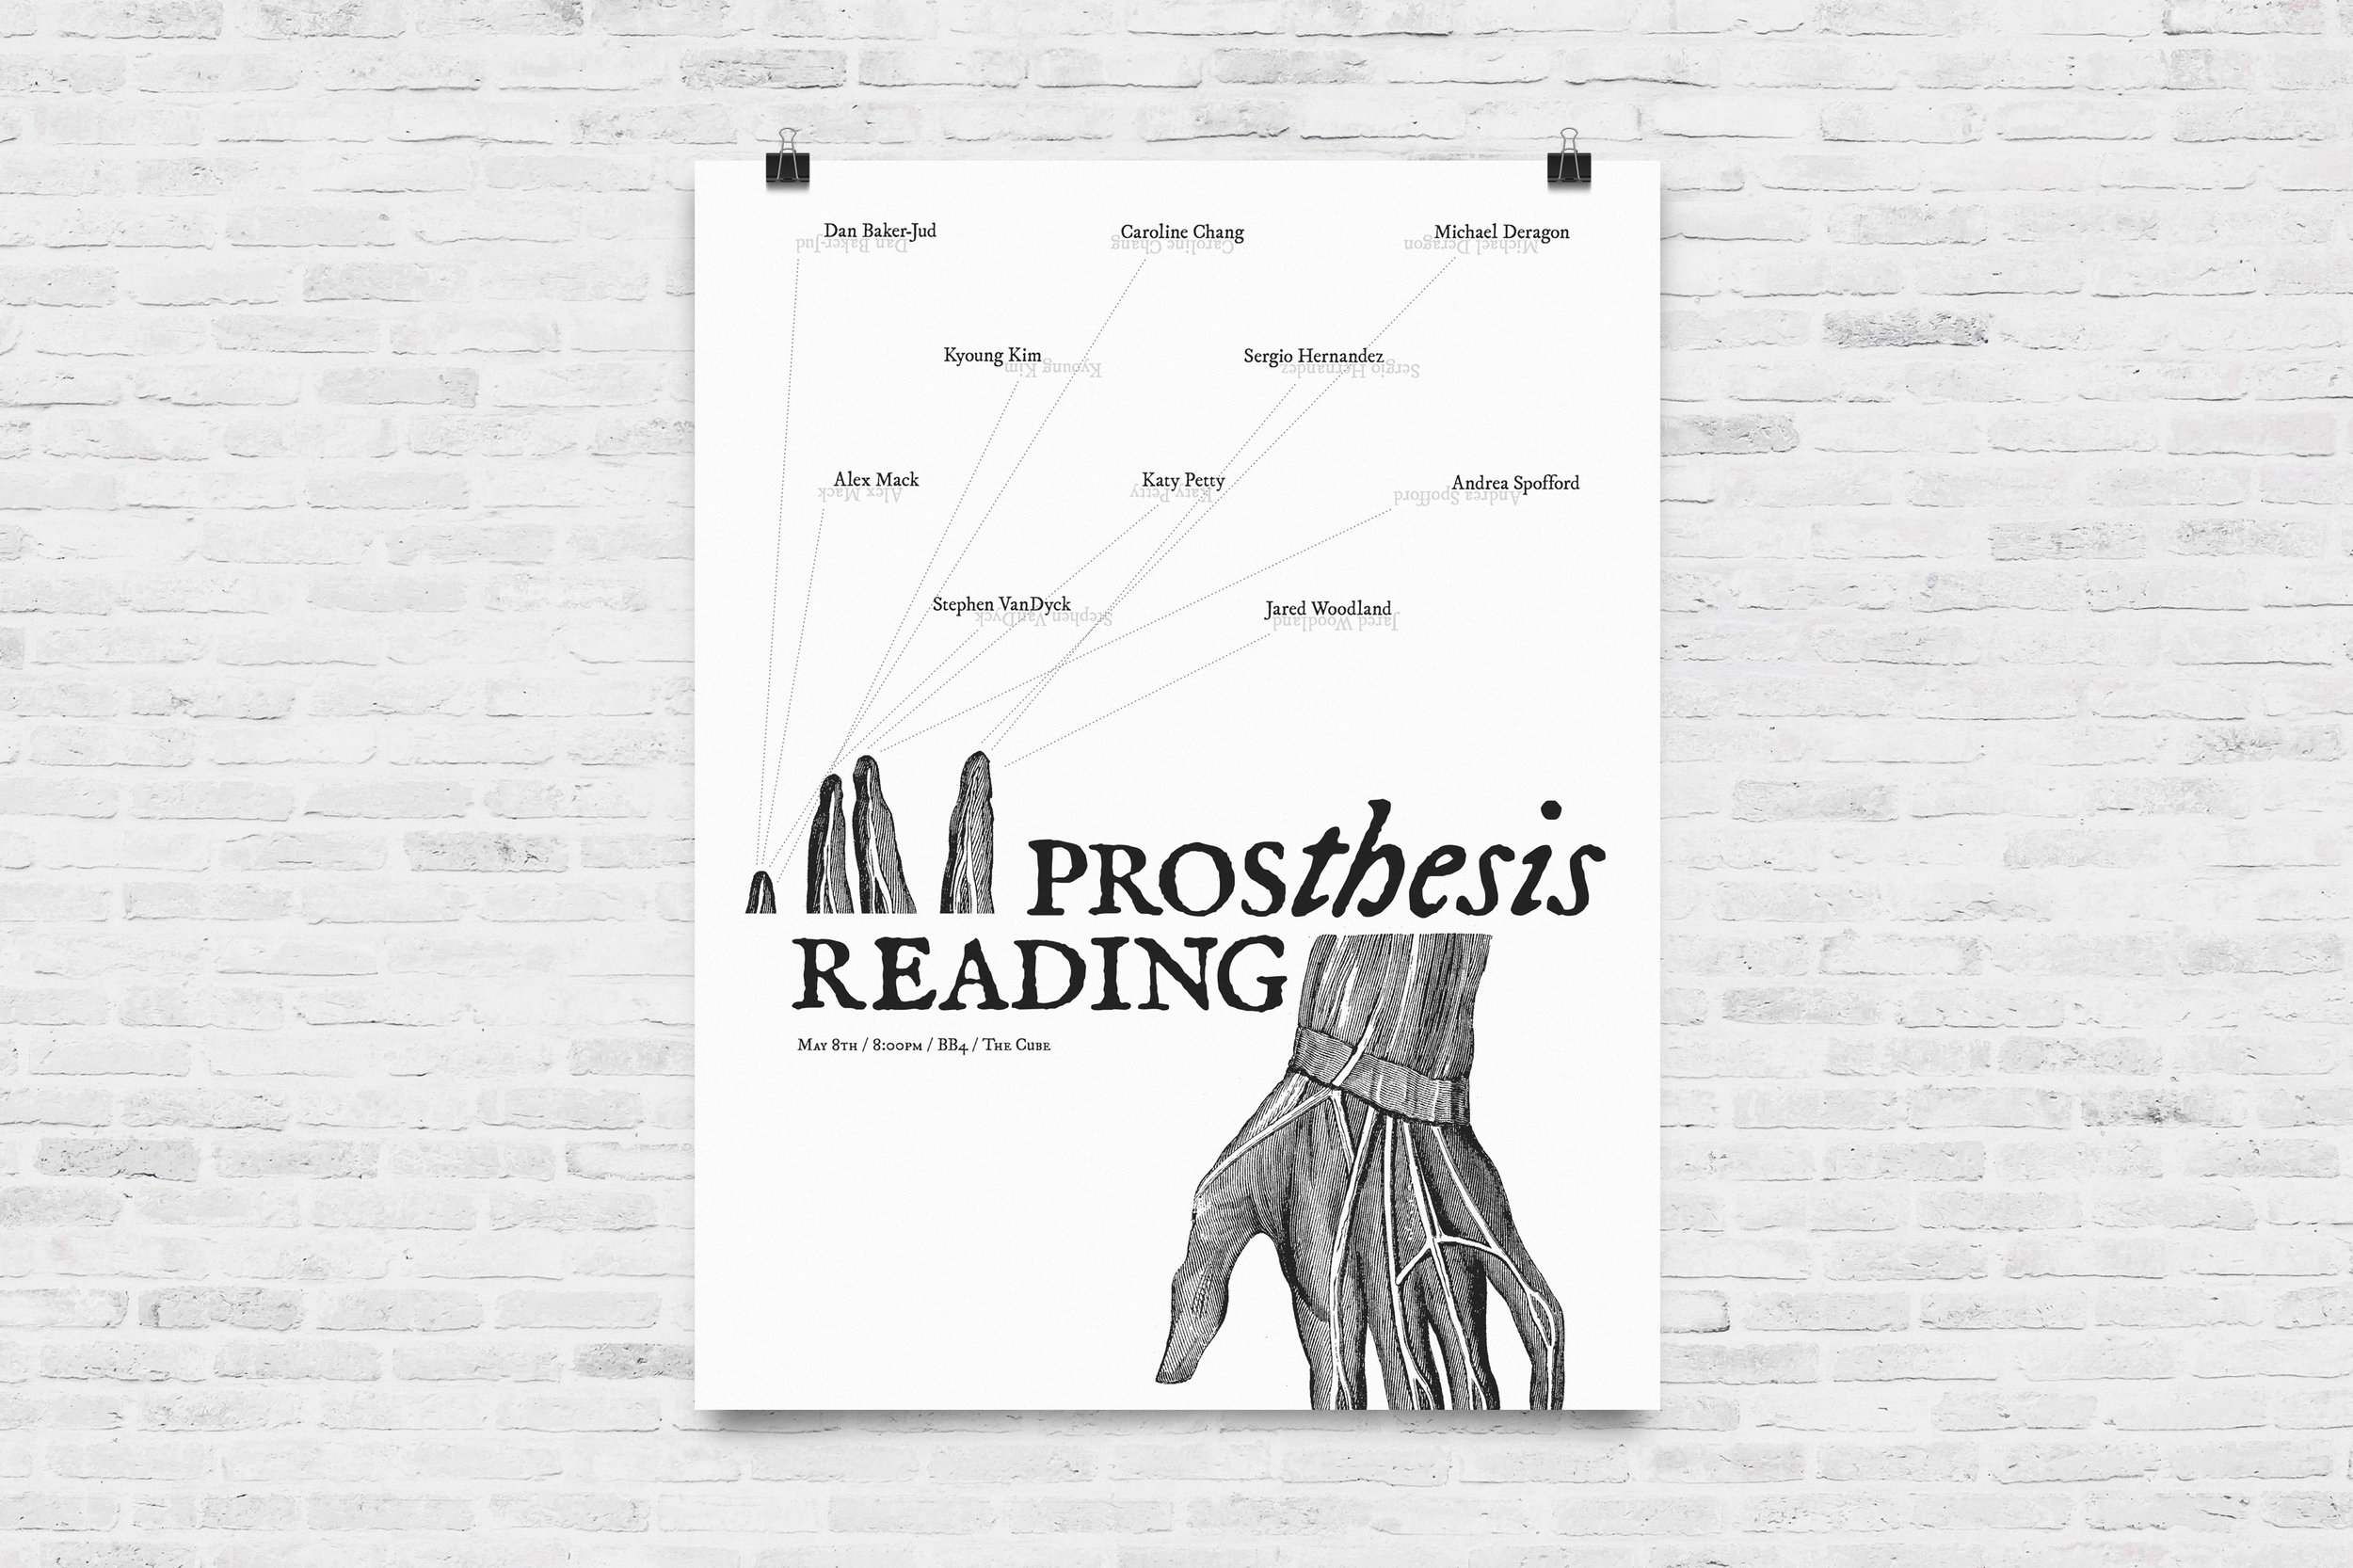 prosthesis_2x3_10.jpg